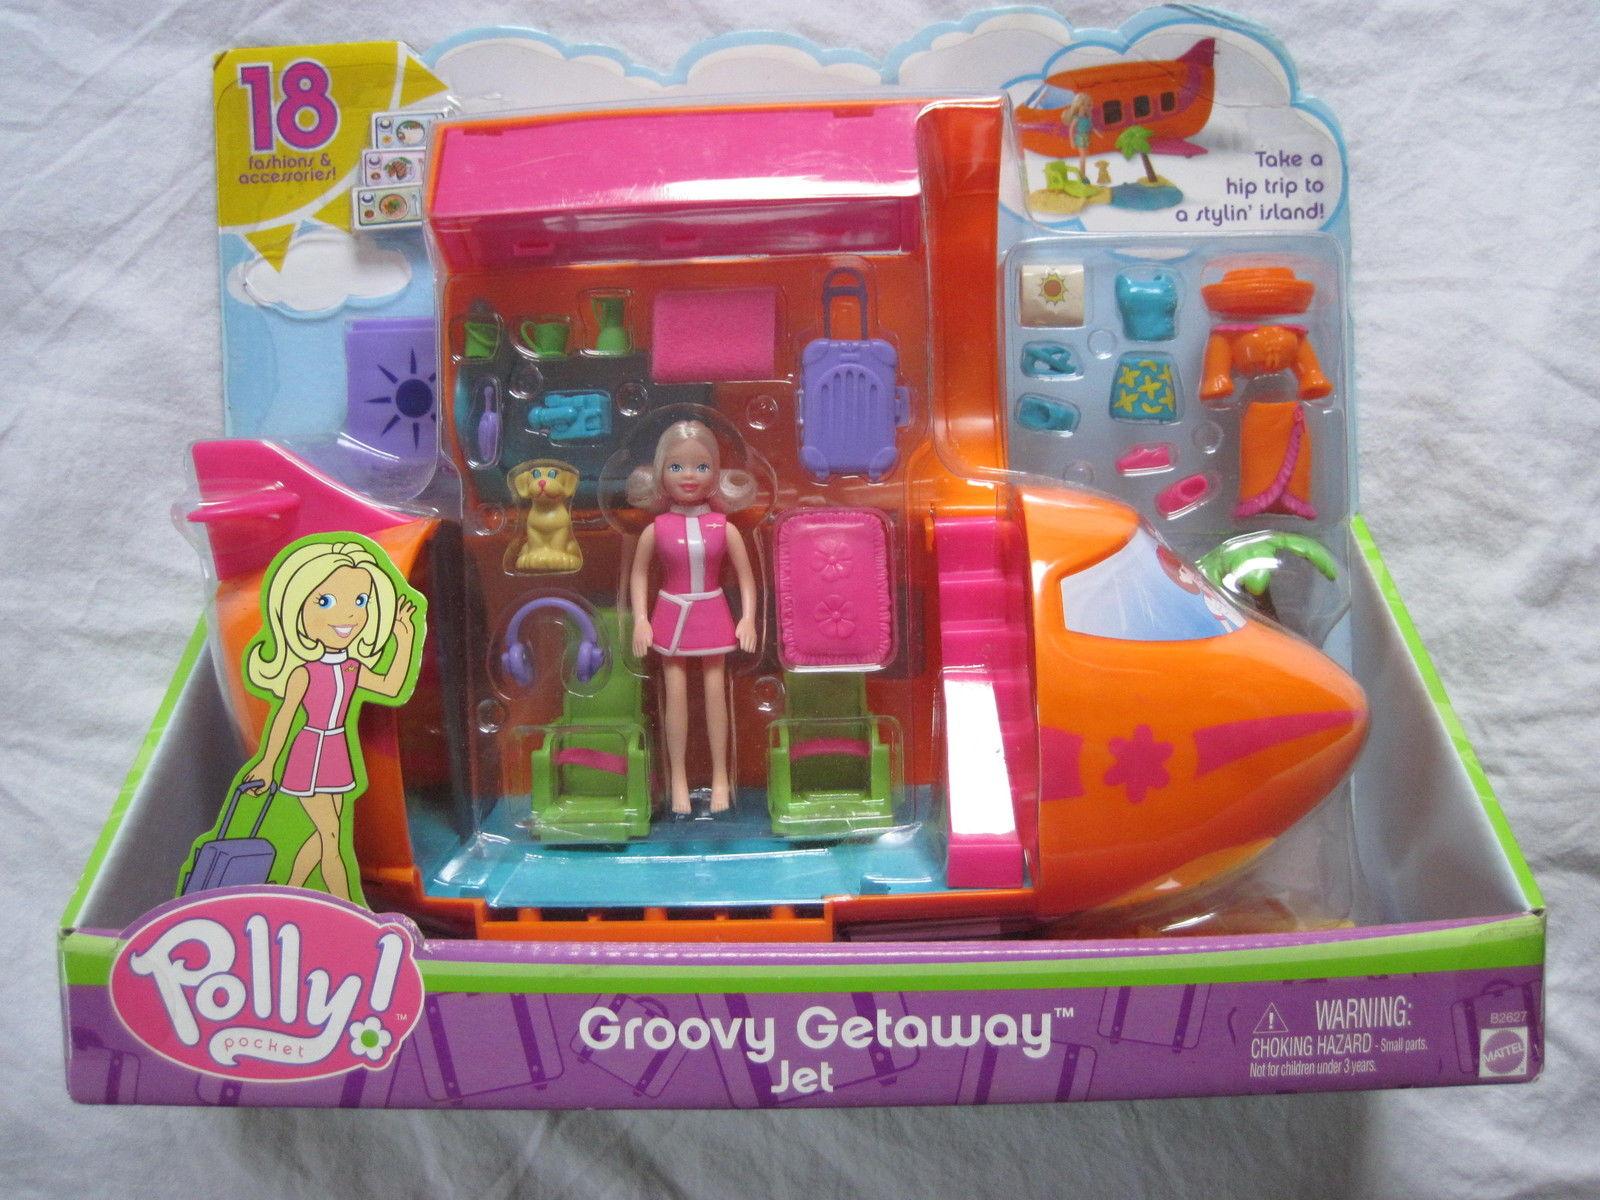 File:Polly Pocket Groovy Getaway Jet.jpg